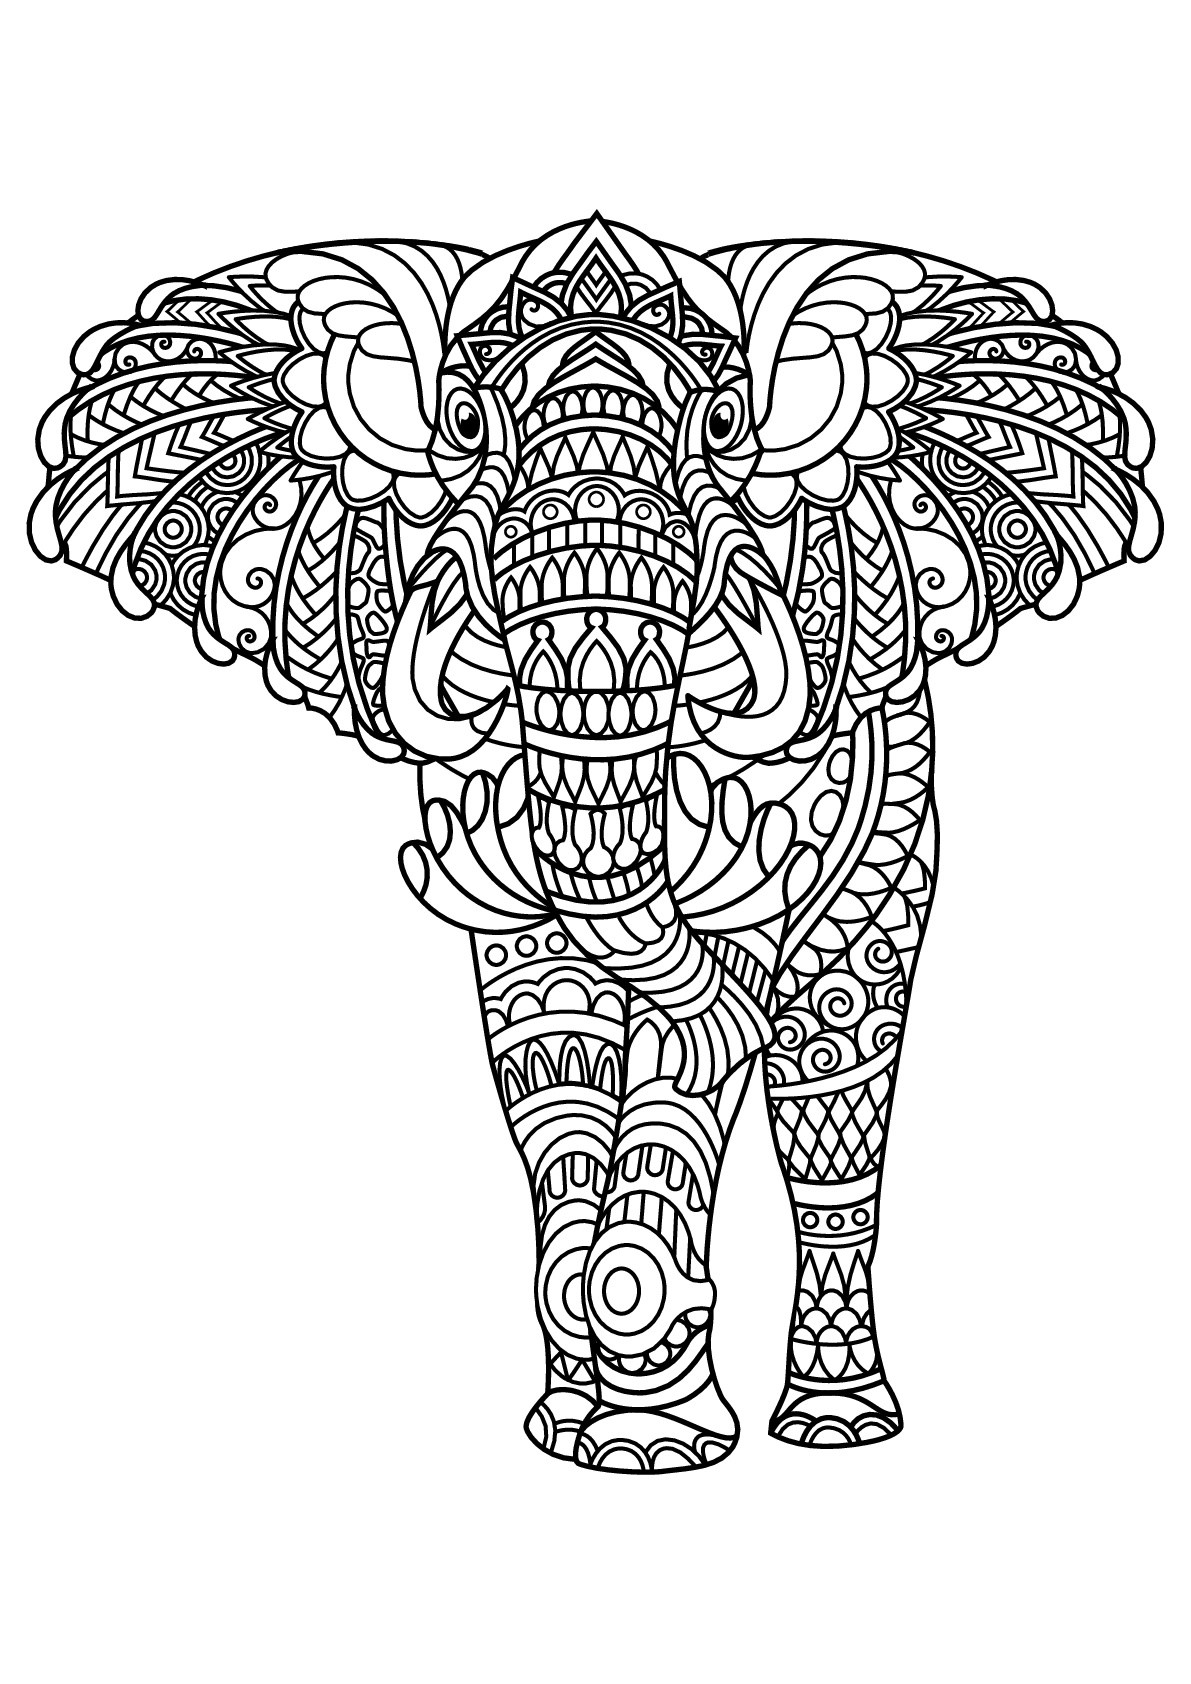 Free book elephant - Elephants Adult Coloring Pages | free printable coloring pages for adults animals